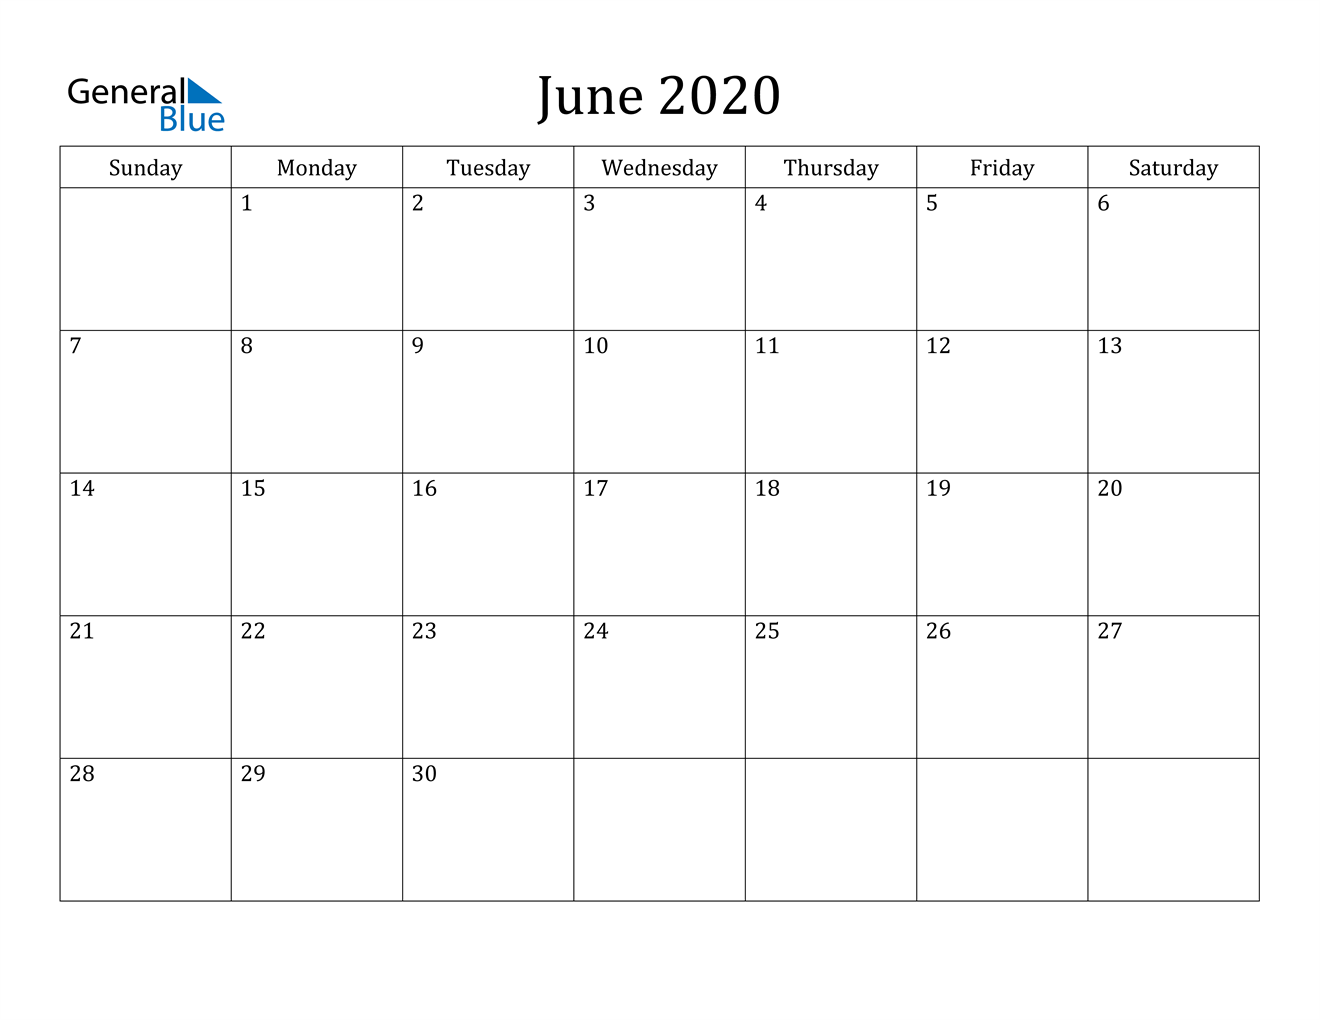 Image of June 2020 Classic Professional Calendar Calendar